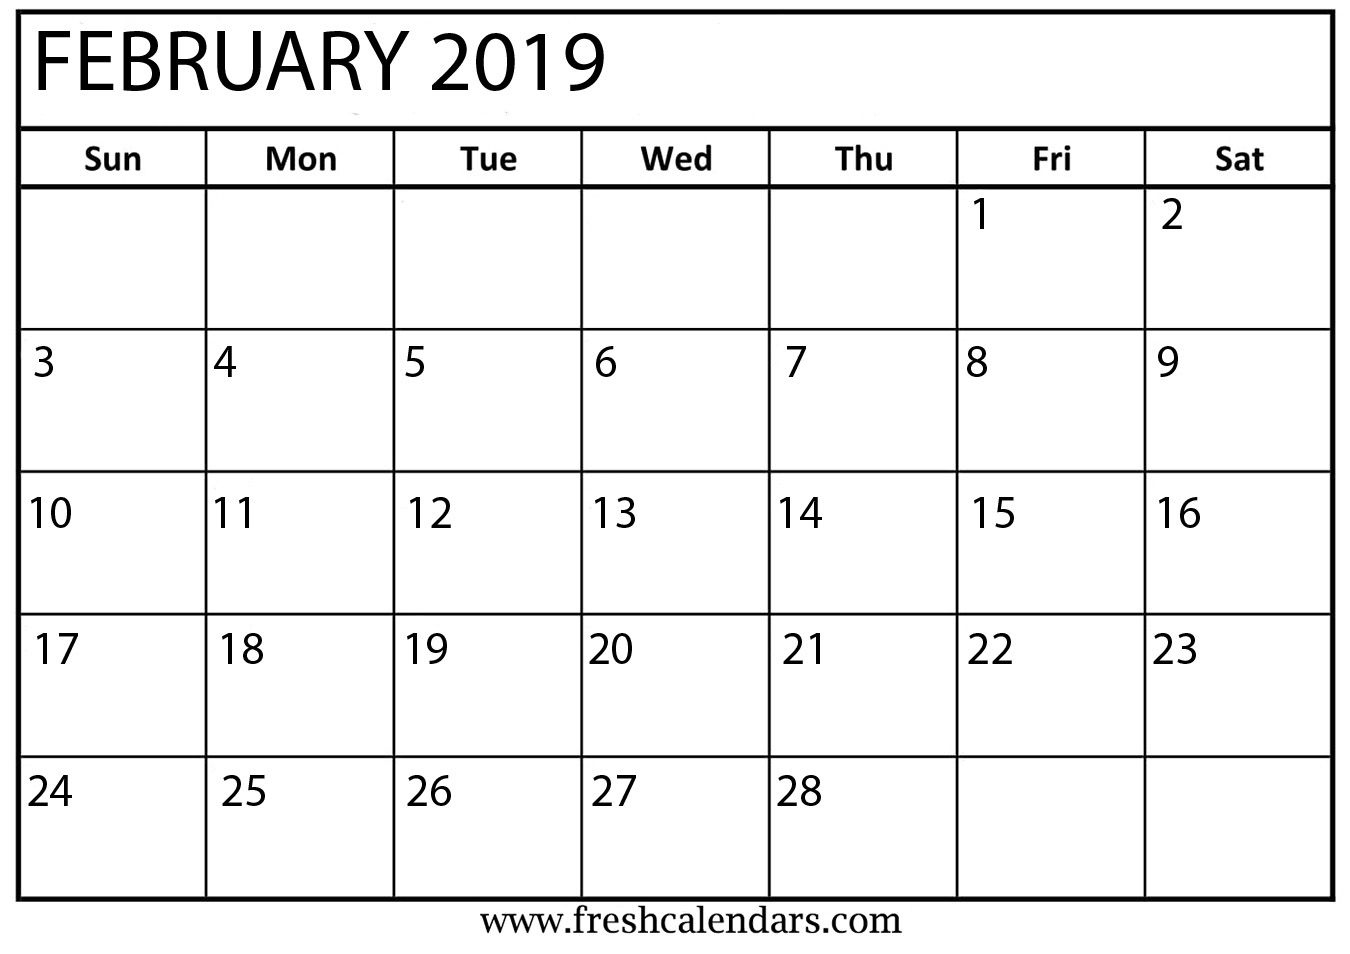 February Month Calendar 2019 Blank Template   Blank February 2019 Free Calendar Template Kindergarten